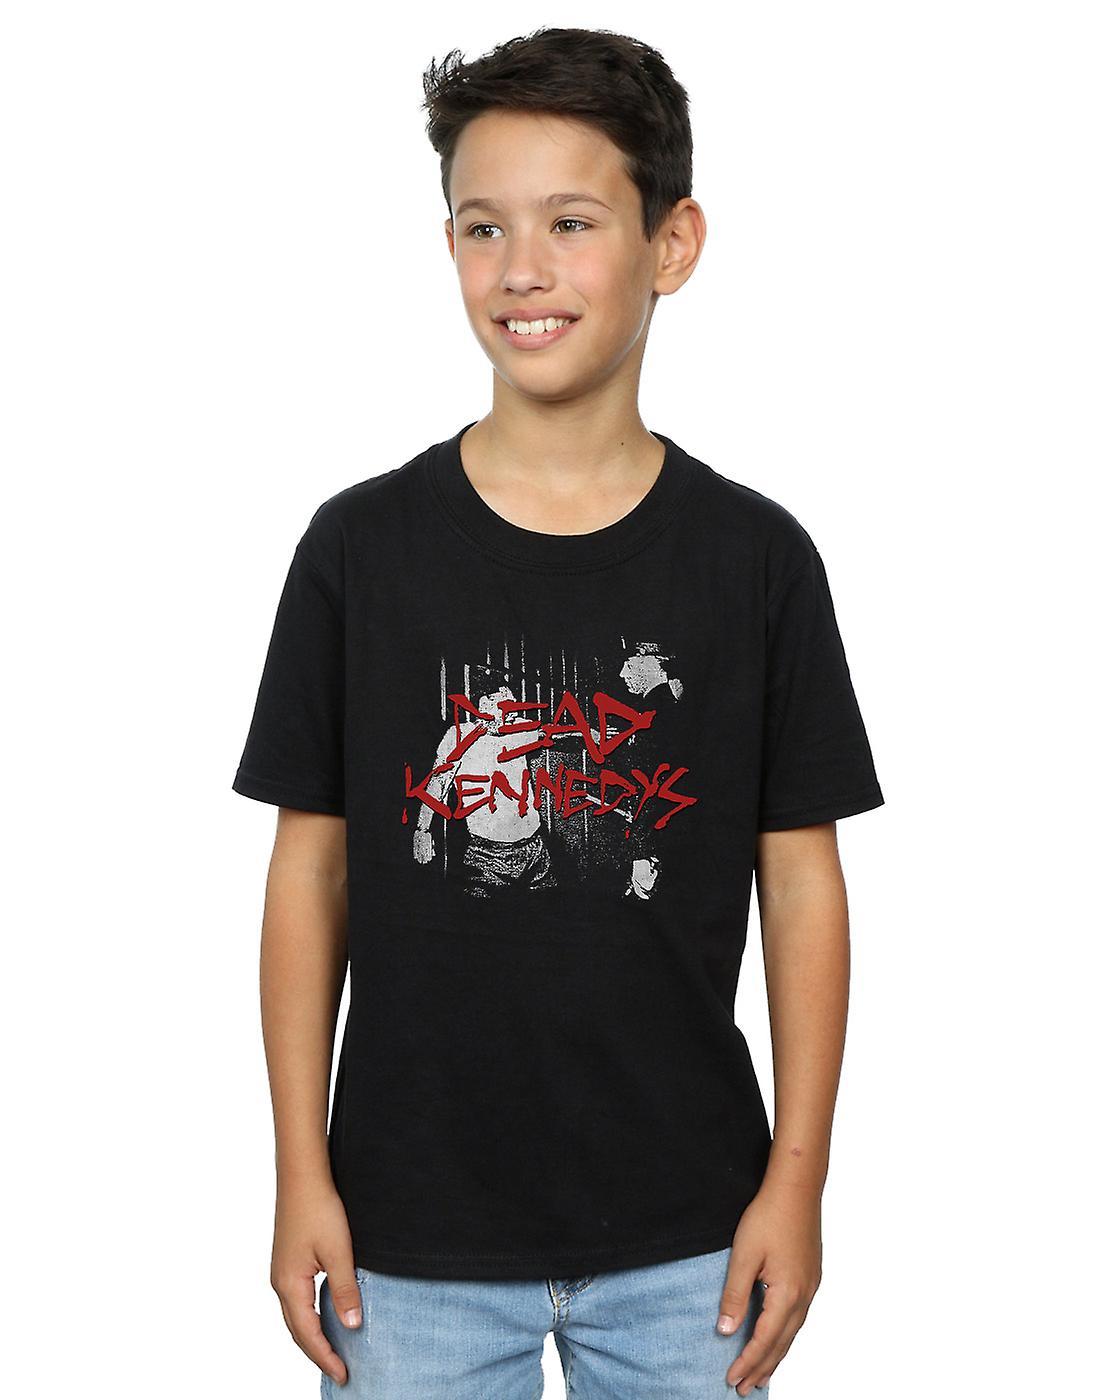 Dead Kennedys Boys Police Truck T-Shirt